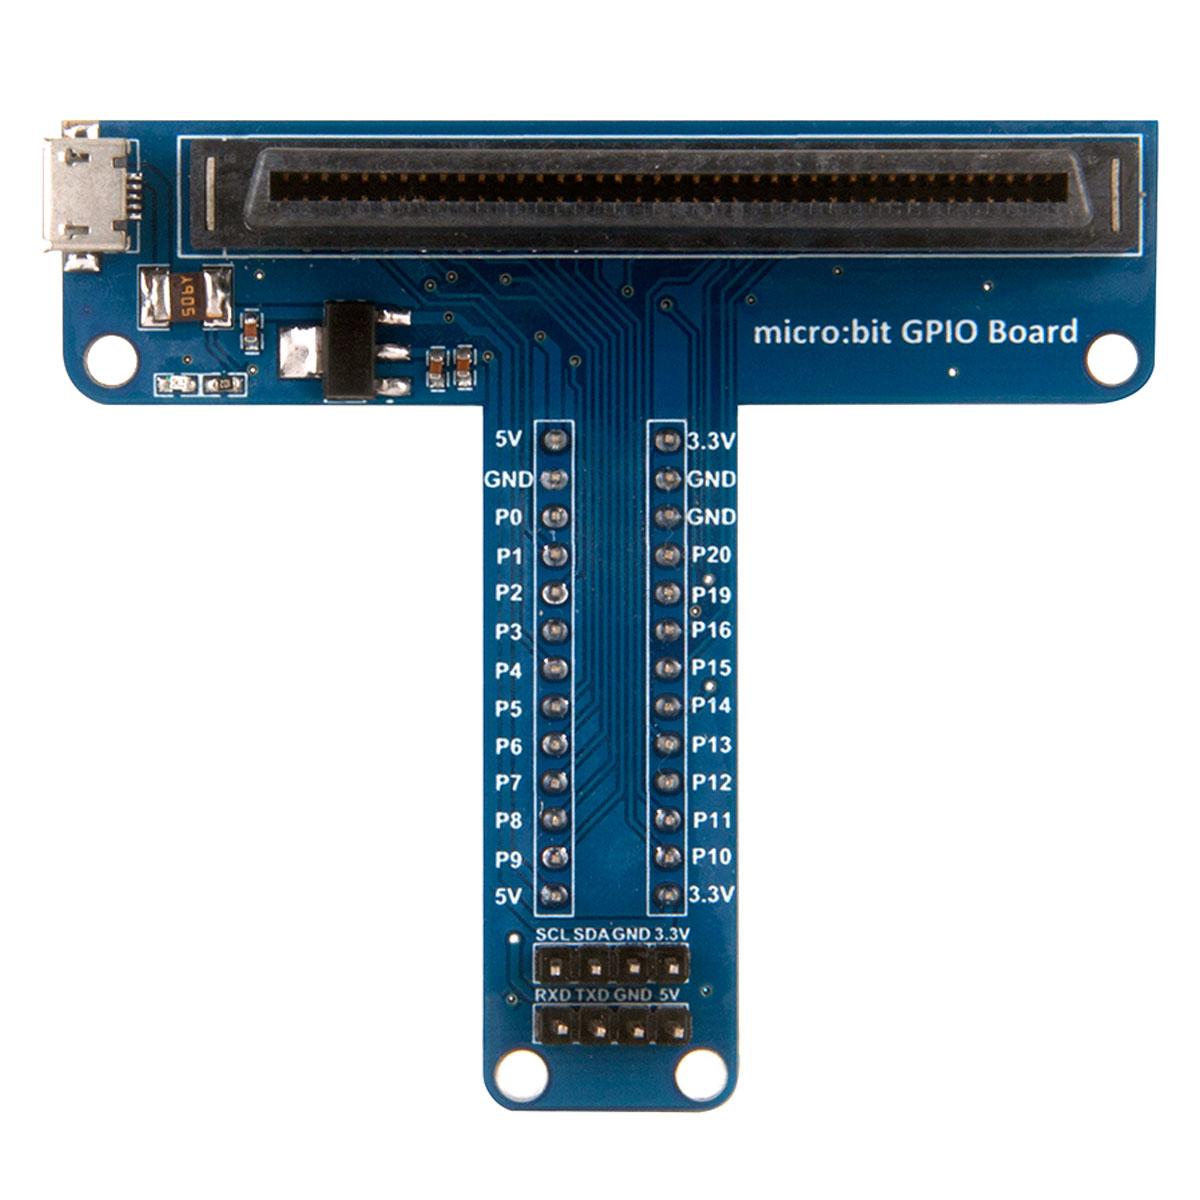 Shield adaptador expansor para conectar Placa BBC Microbit Micro:bit na Protoboard